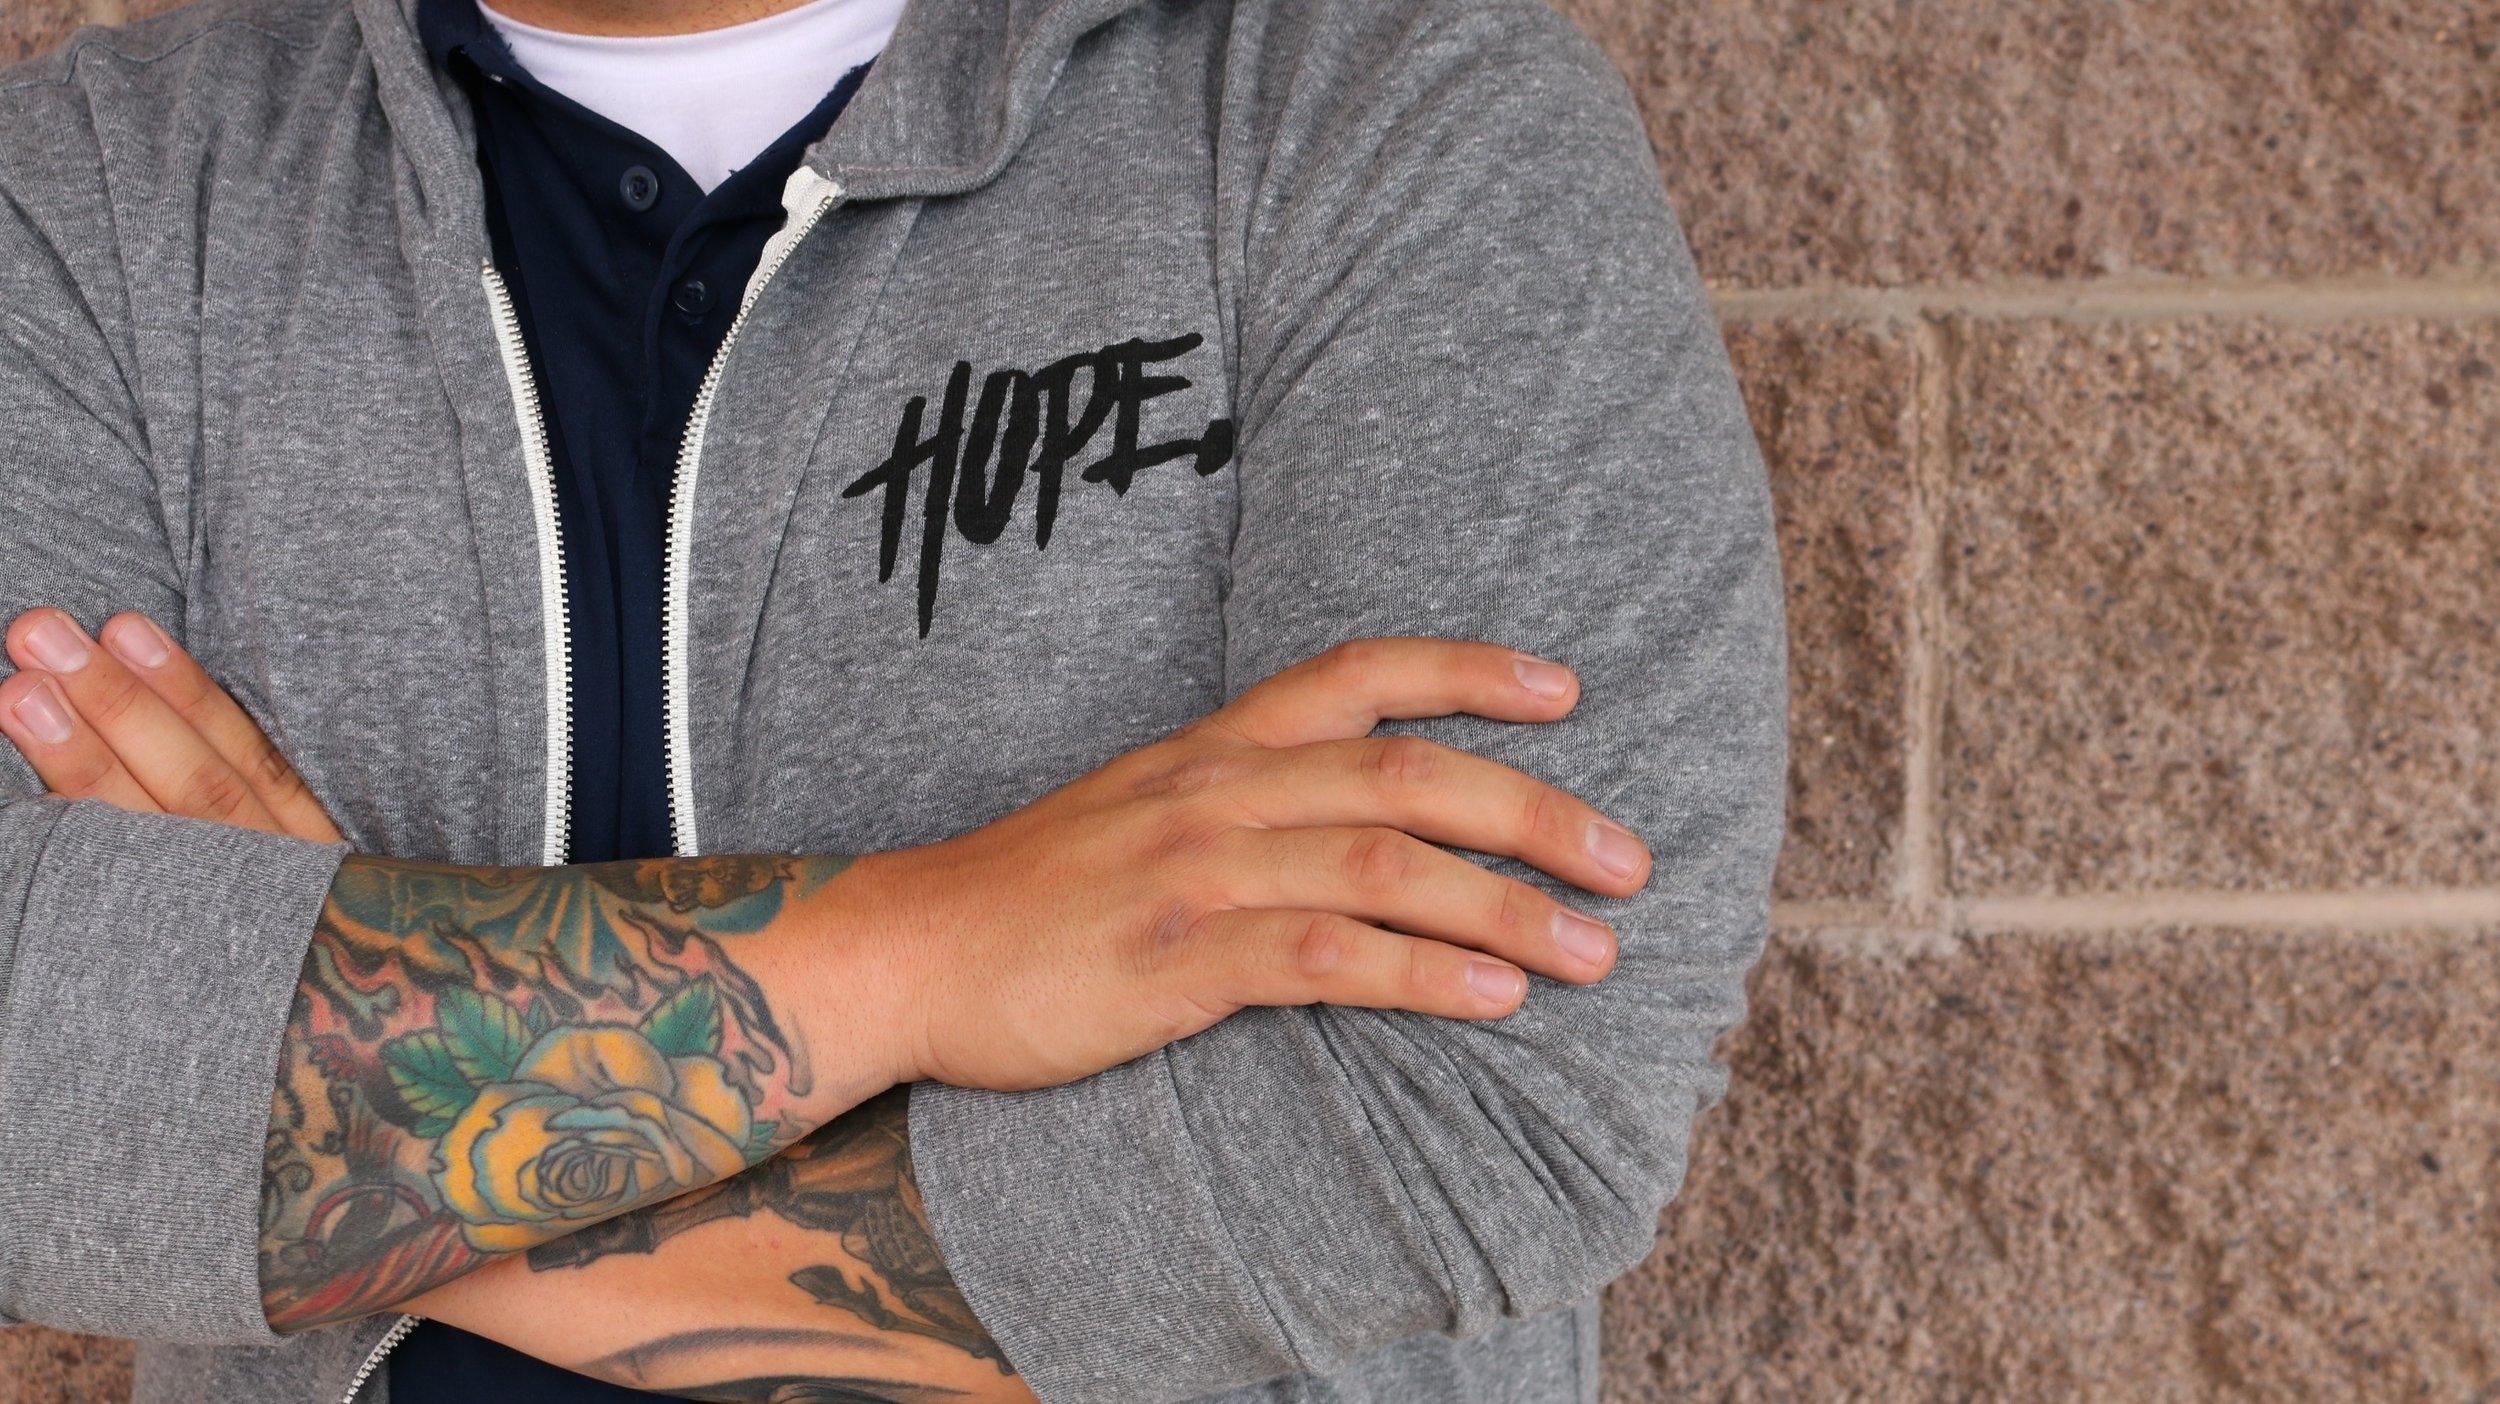 hope youth.jpeg